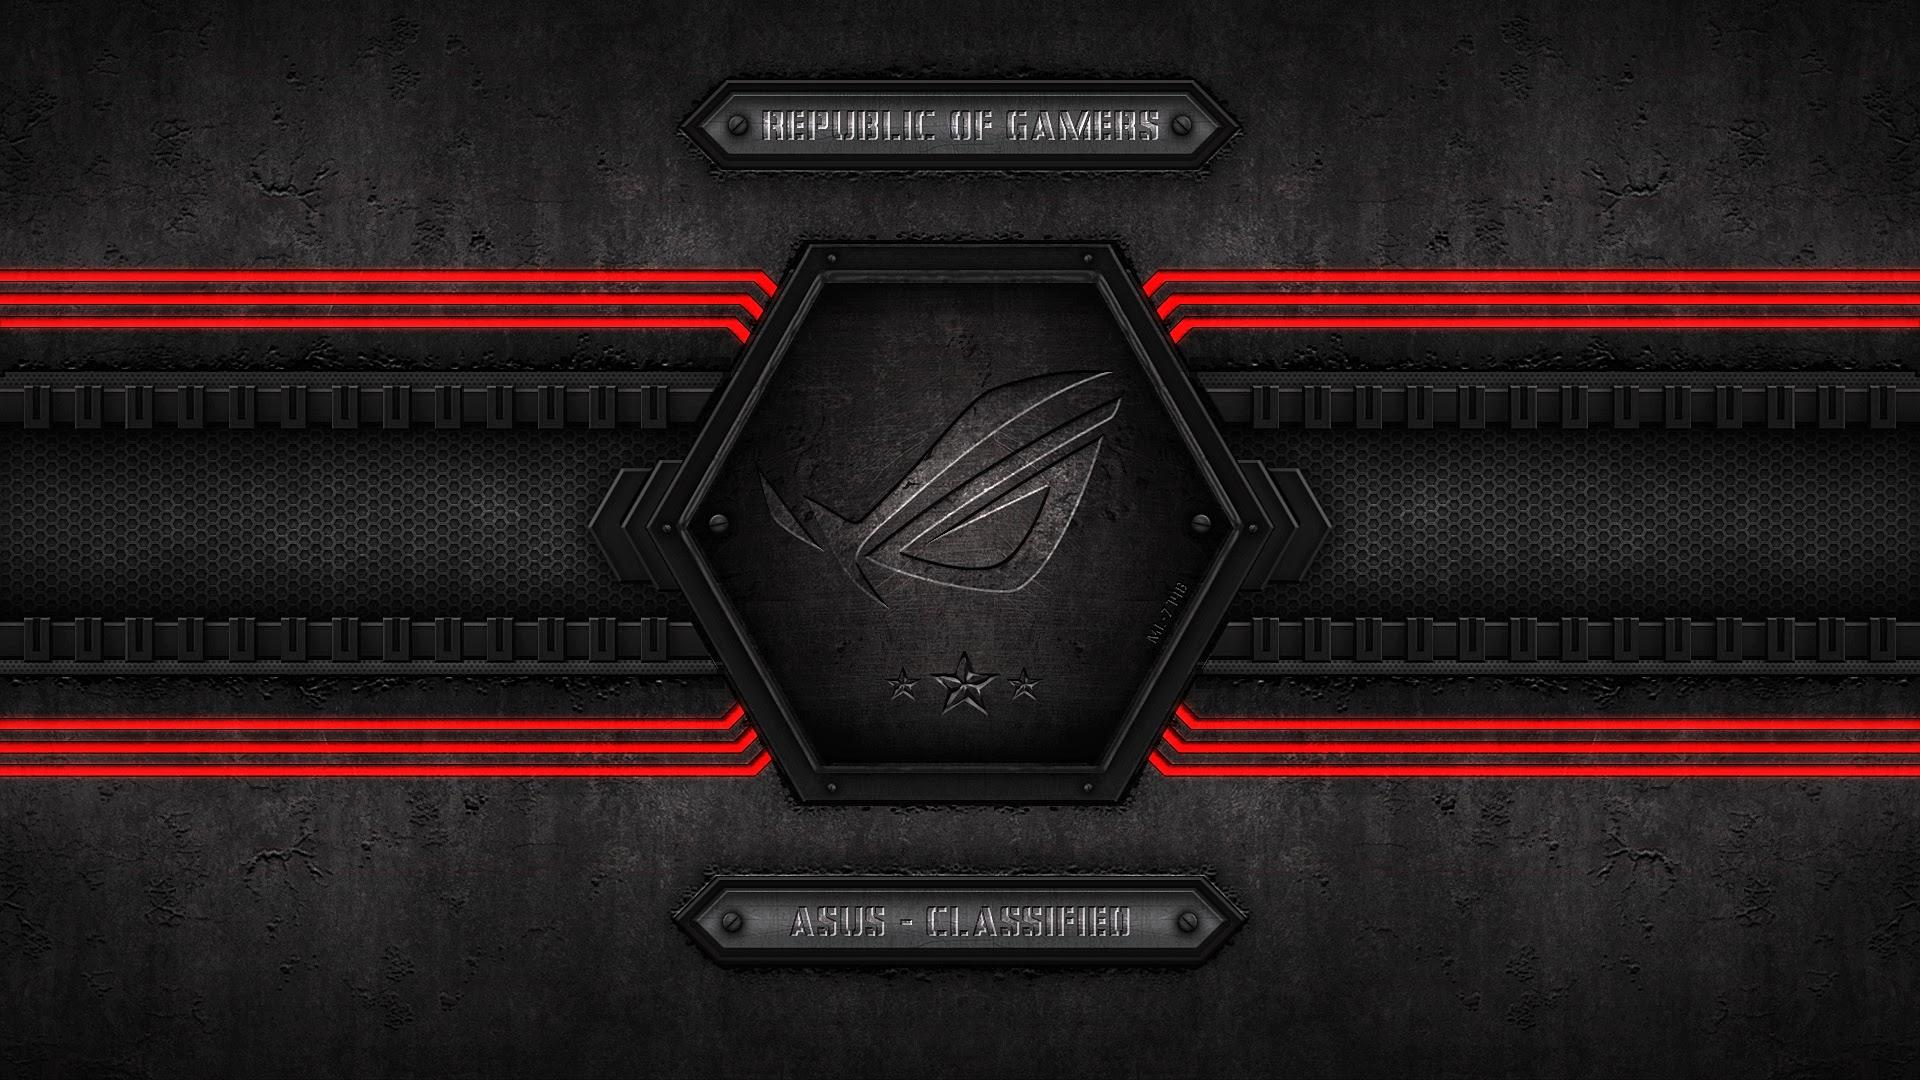 asus rog republic of gamers logo metal background 3 star hd wallpaper 1920x1080